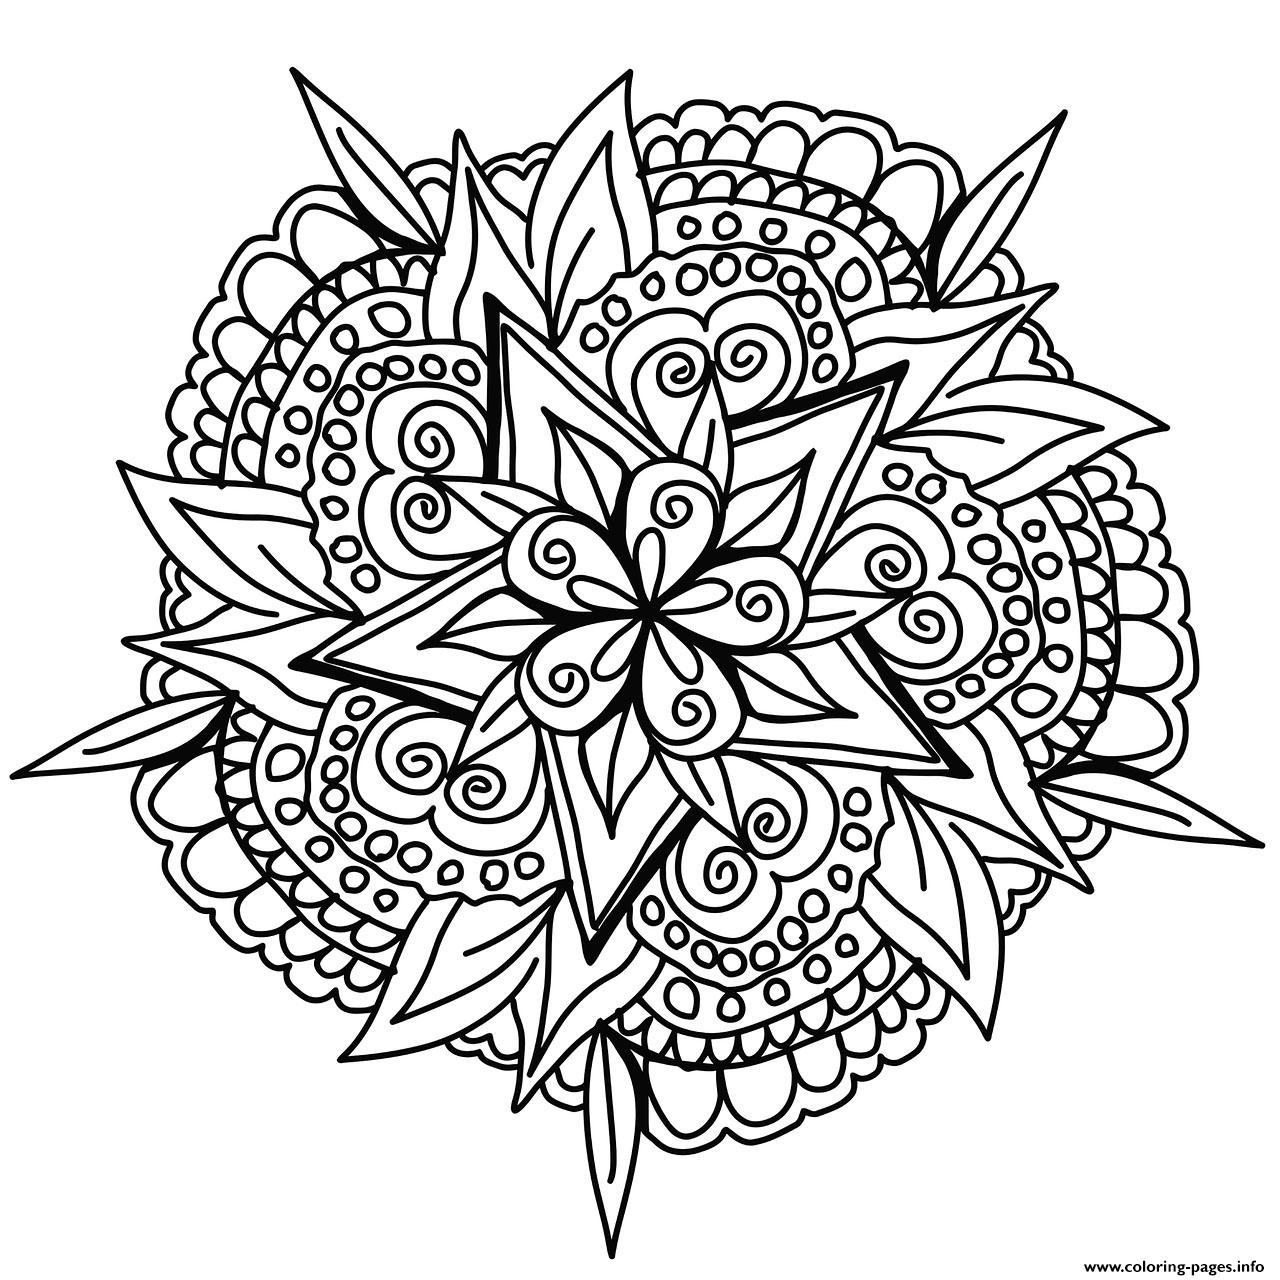 Cool Hand Drawn Mandala Coloring Pages Printable